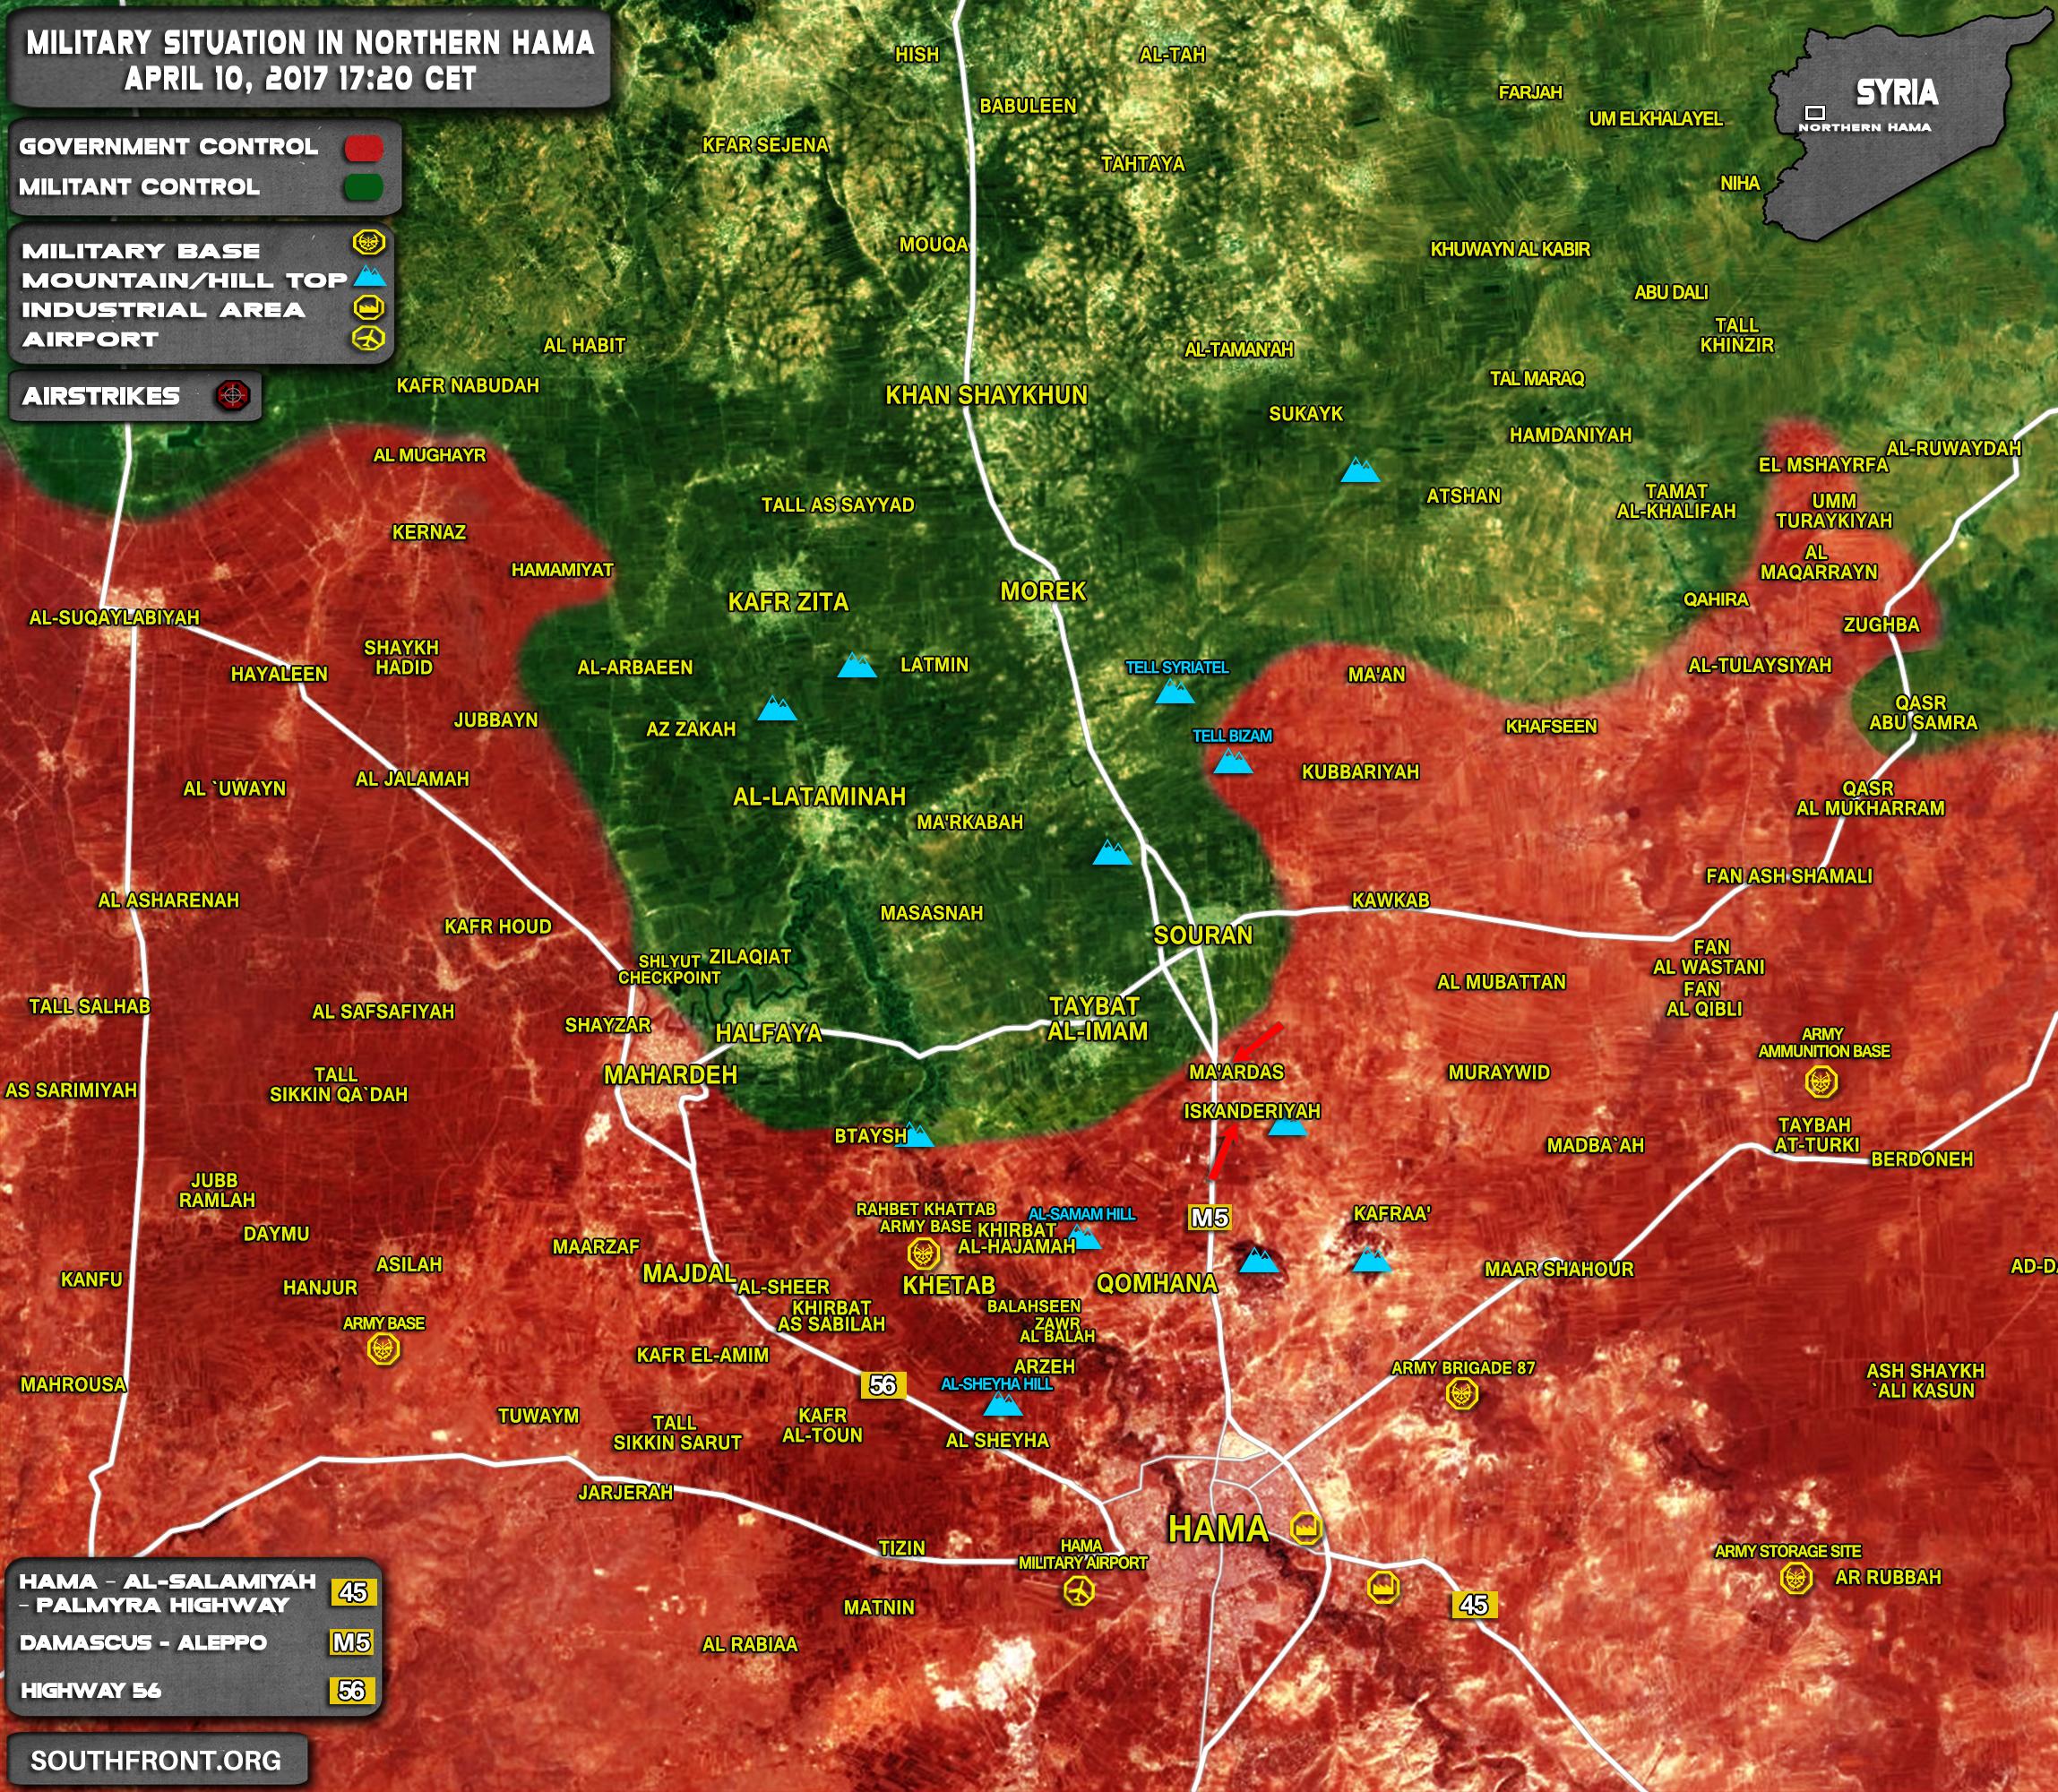 Northern Hama Battle: Militants Repelled Govt Advance On Halfaya. Syrian Army Takes Back Inskandariyah And Maardas